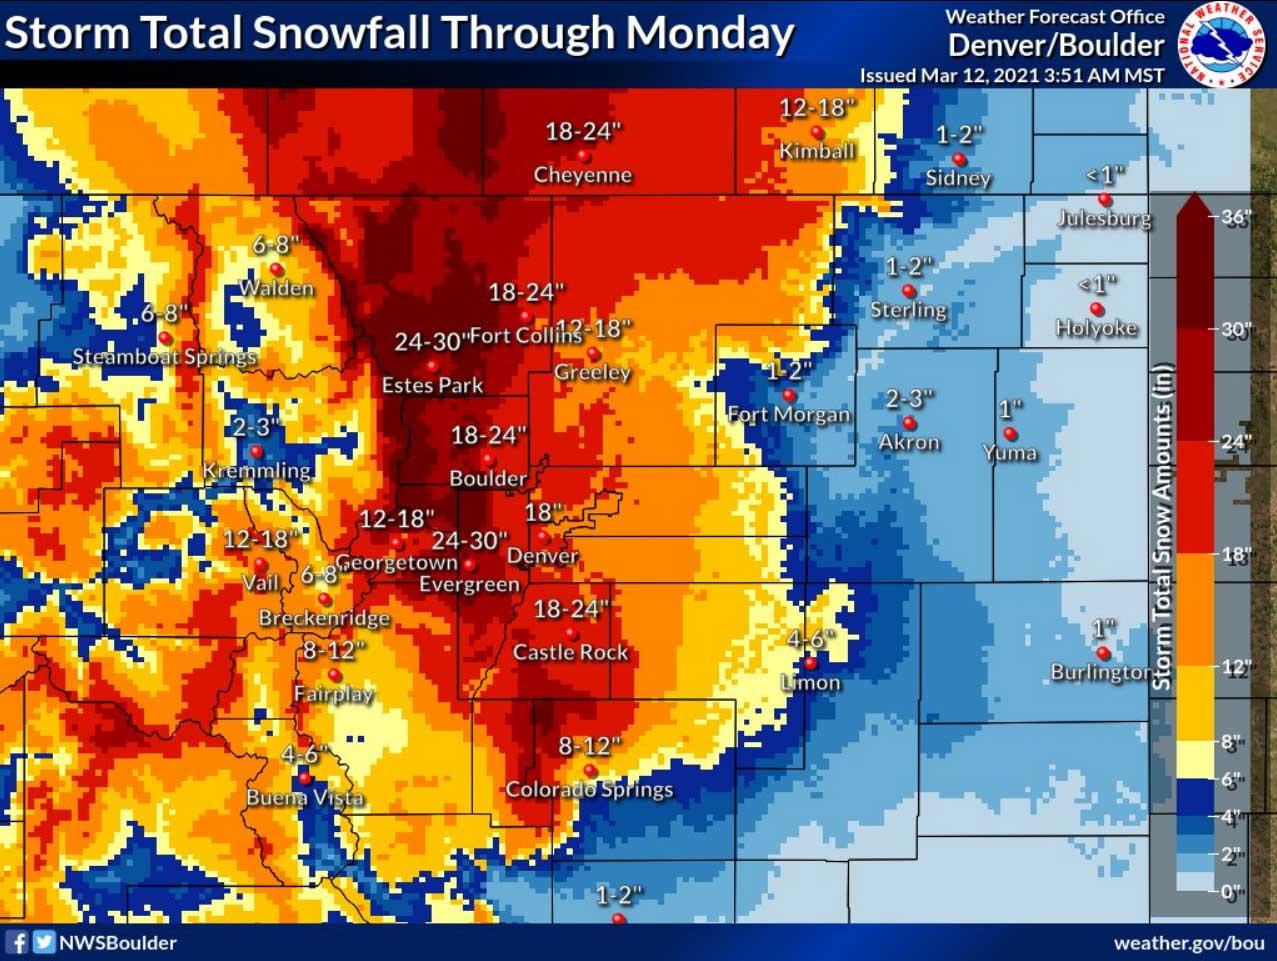 historic-winter-storm-xylia-colorado-snow-severe-weather-outbreak-estimated-snowfall-nws-boulder